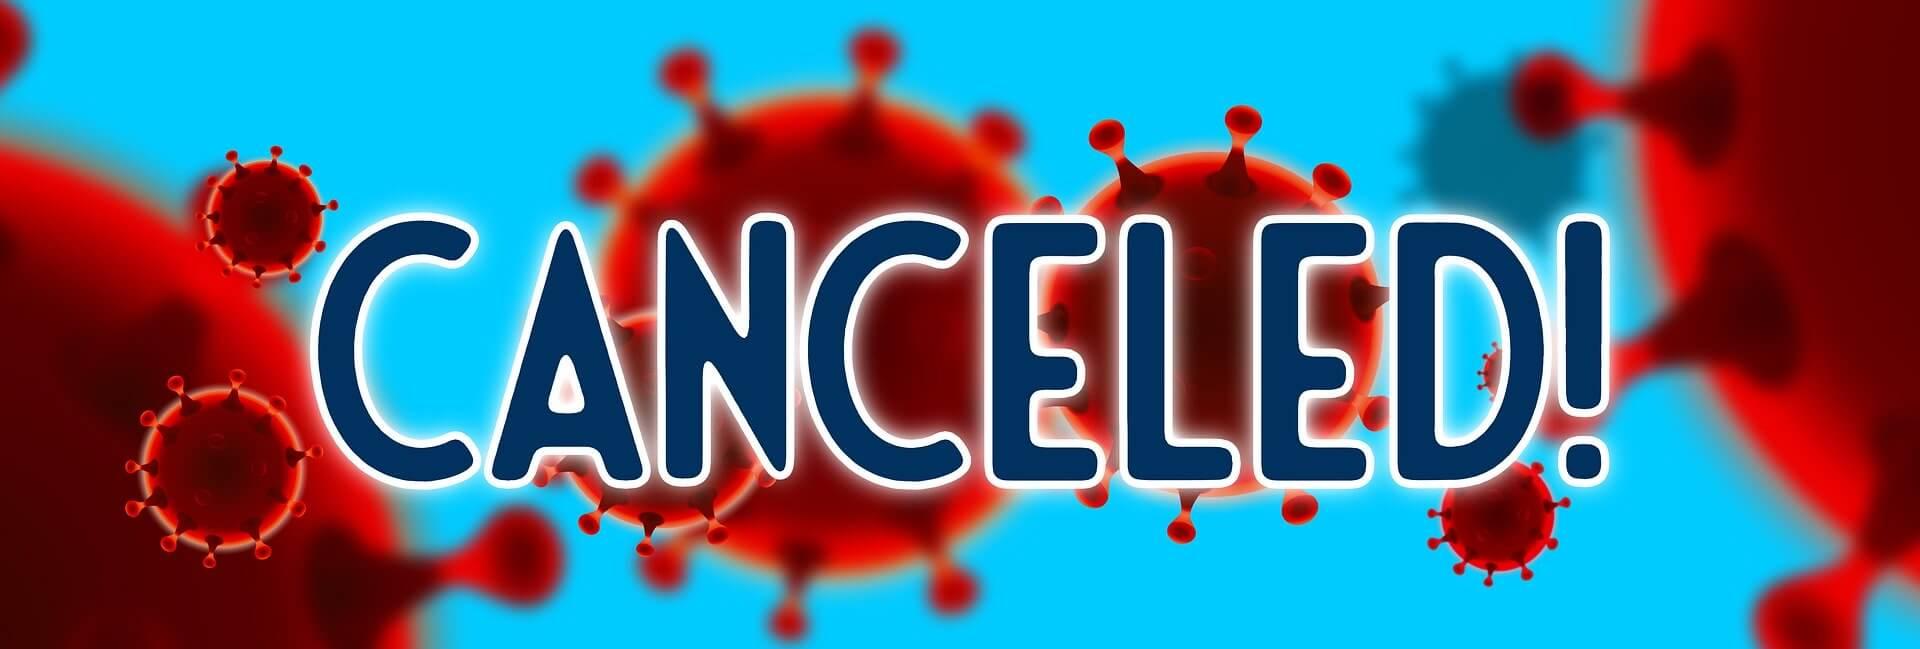 coronavirus blockchain canceled events covid 19